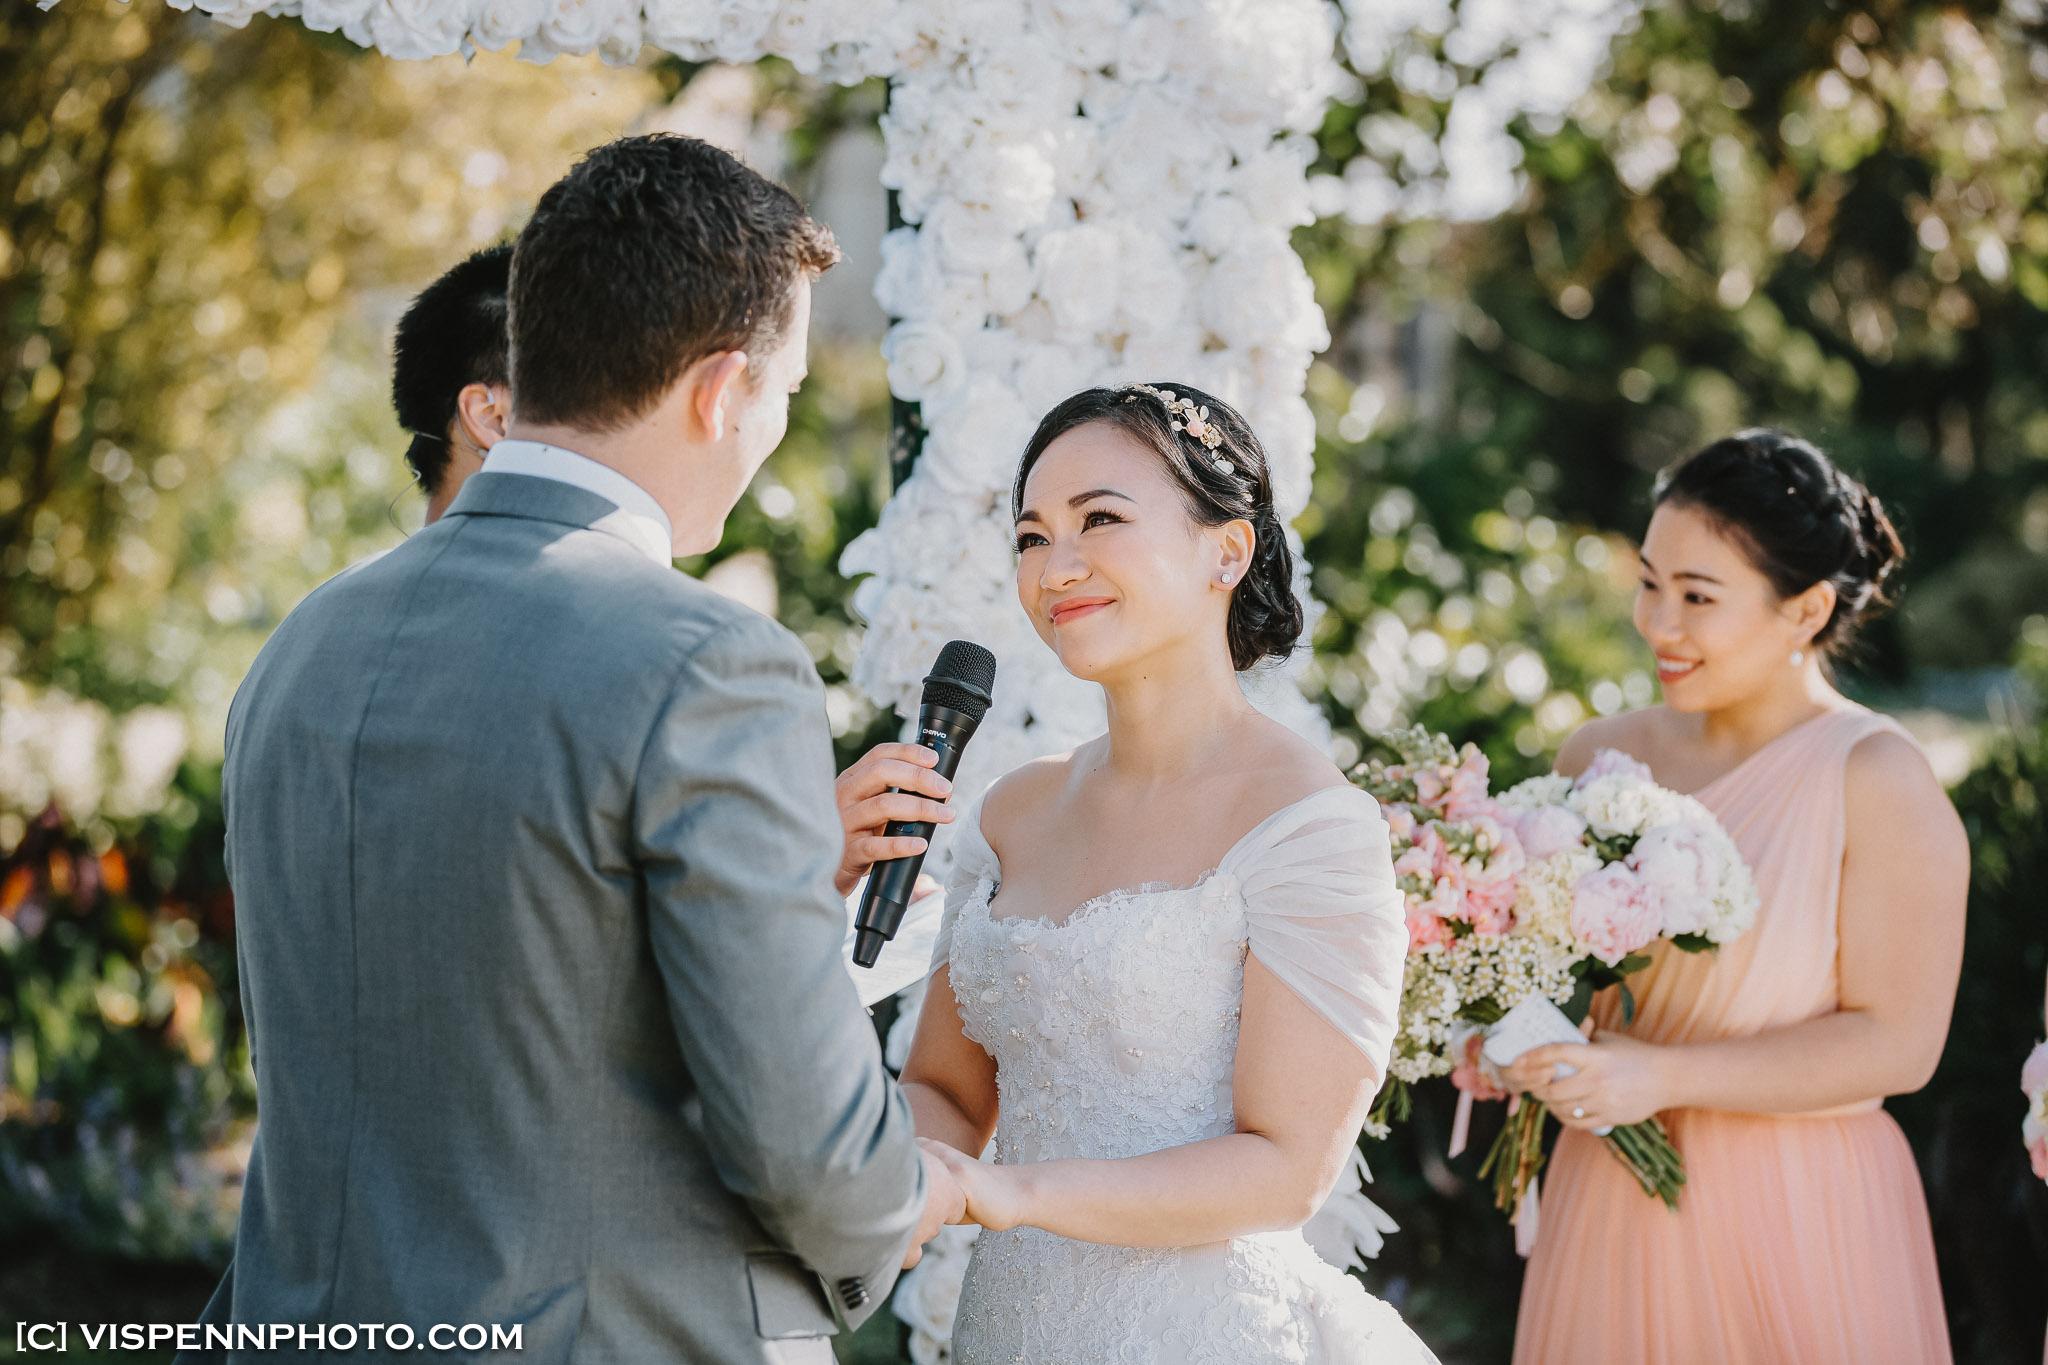 WEDDING DAY Photography Melbourne ZHPENN Kat H1 01717